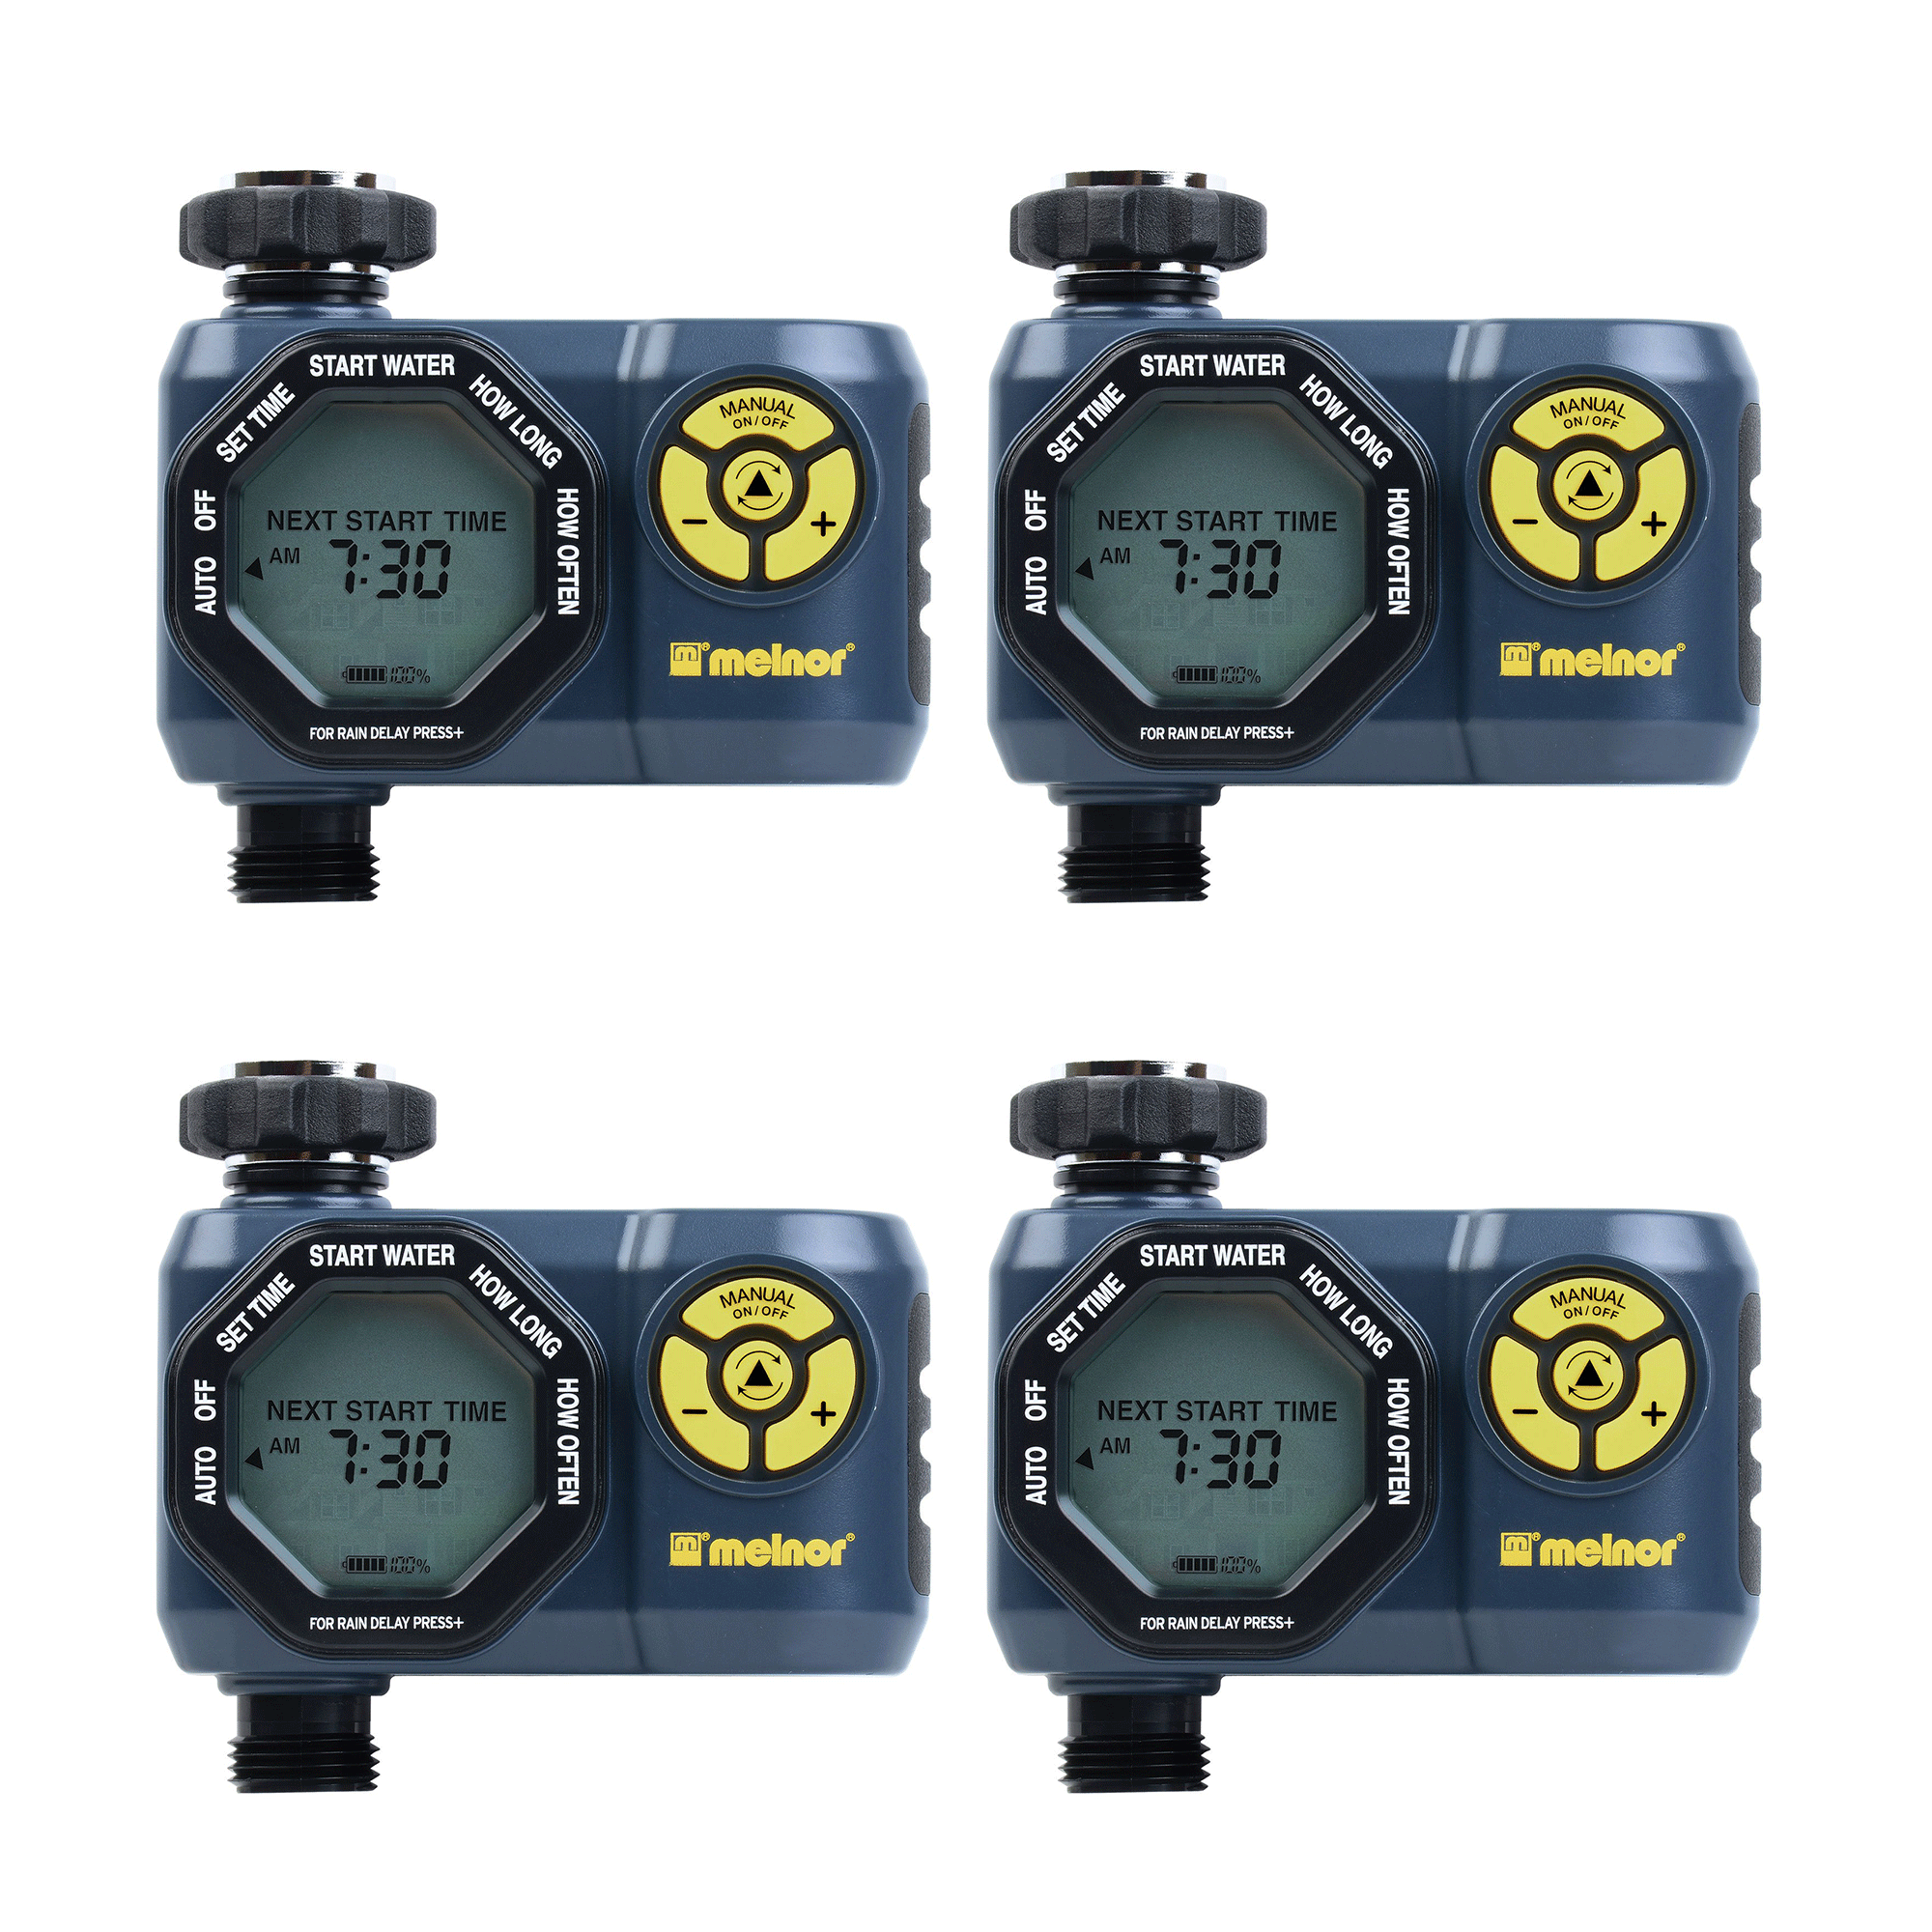 Melnor Digital 1 Zone Programmable Water Timer & Controller for Garden (4 Pack)